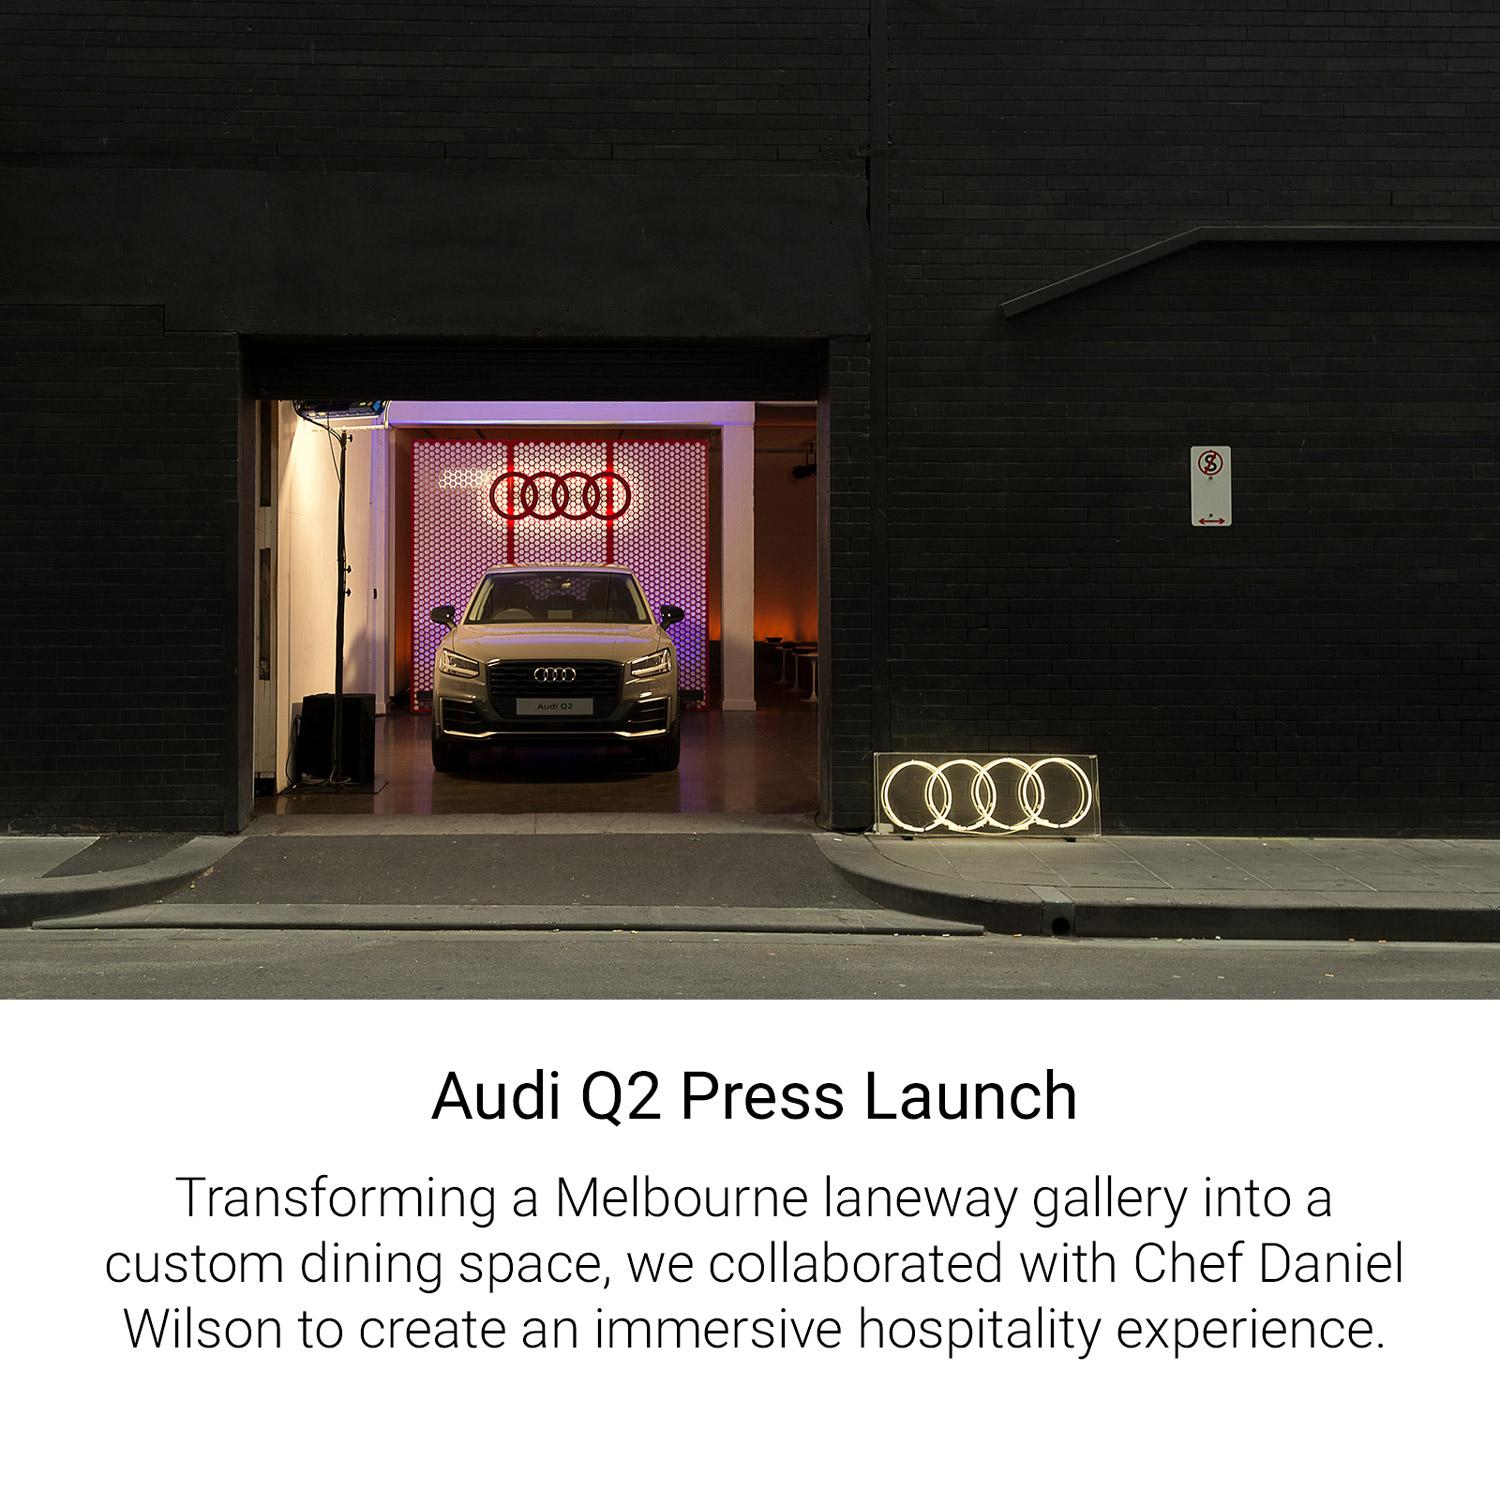 Audi Q2 Press Launch